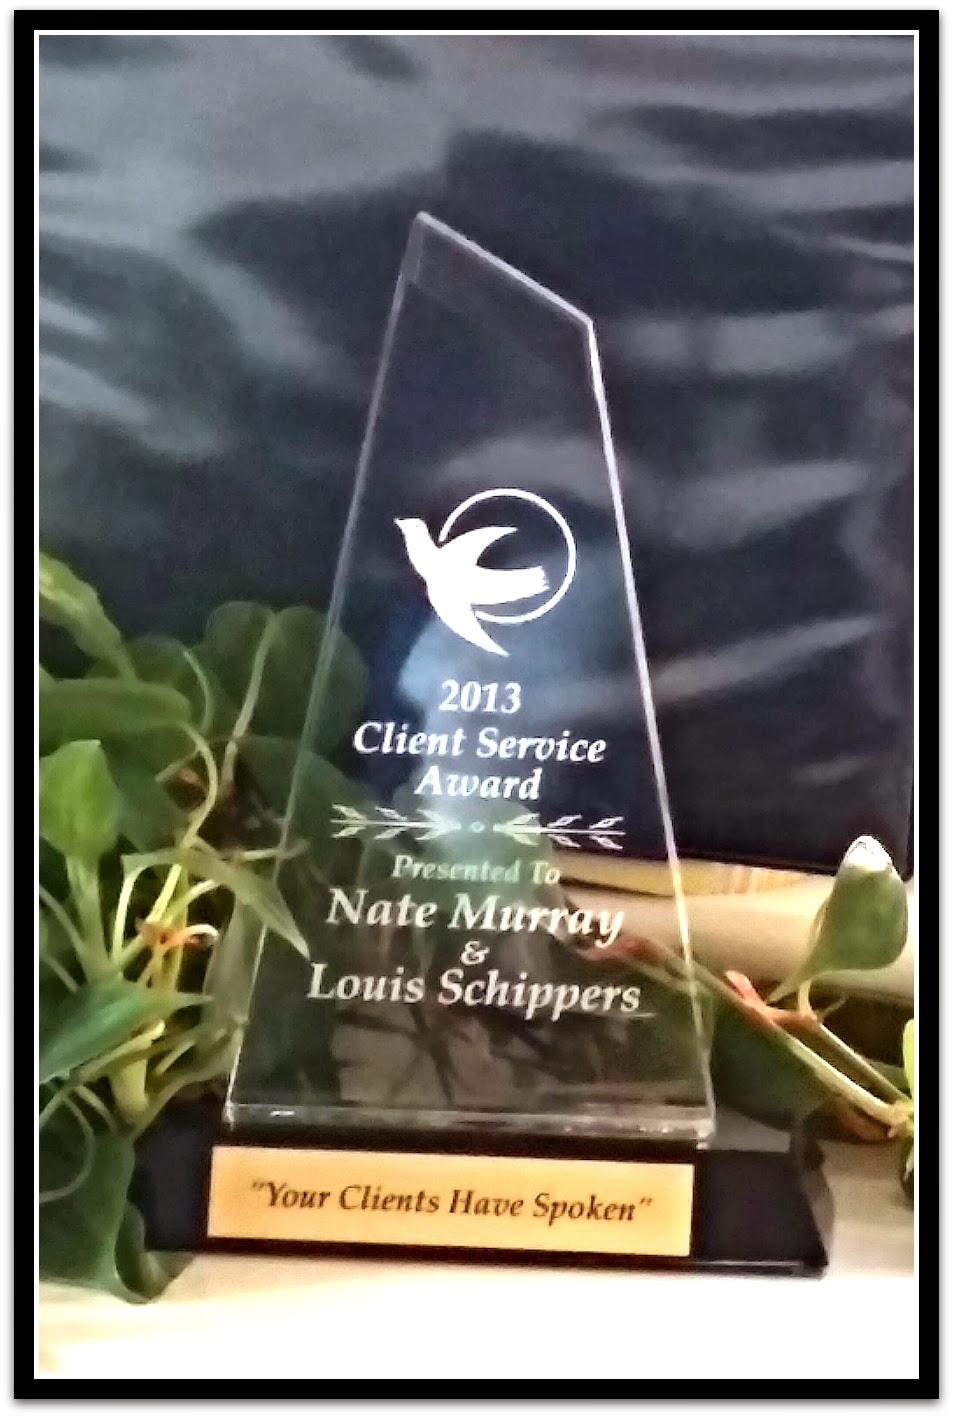 Client Service Award